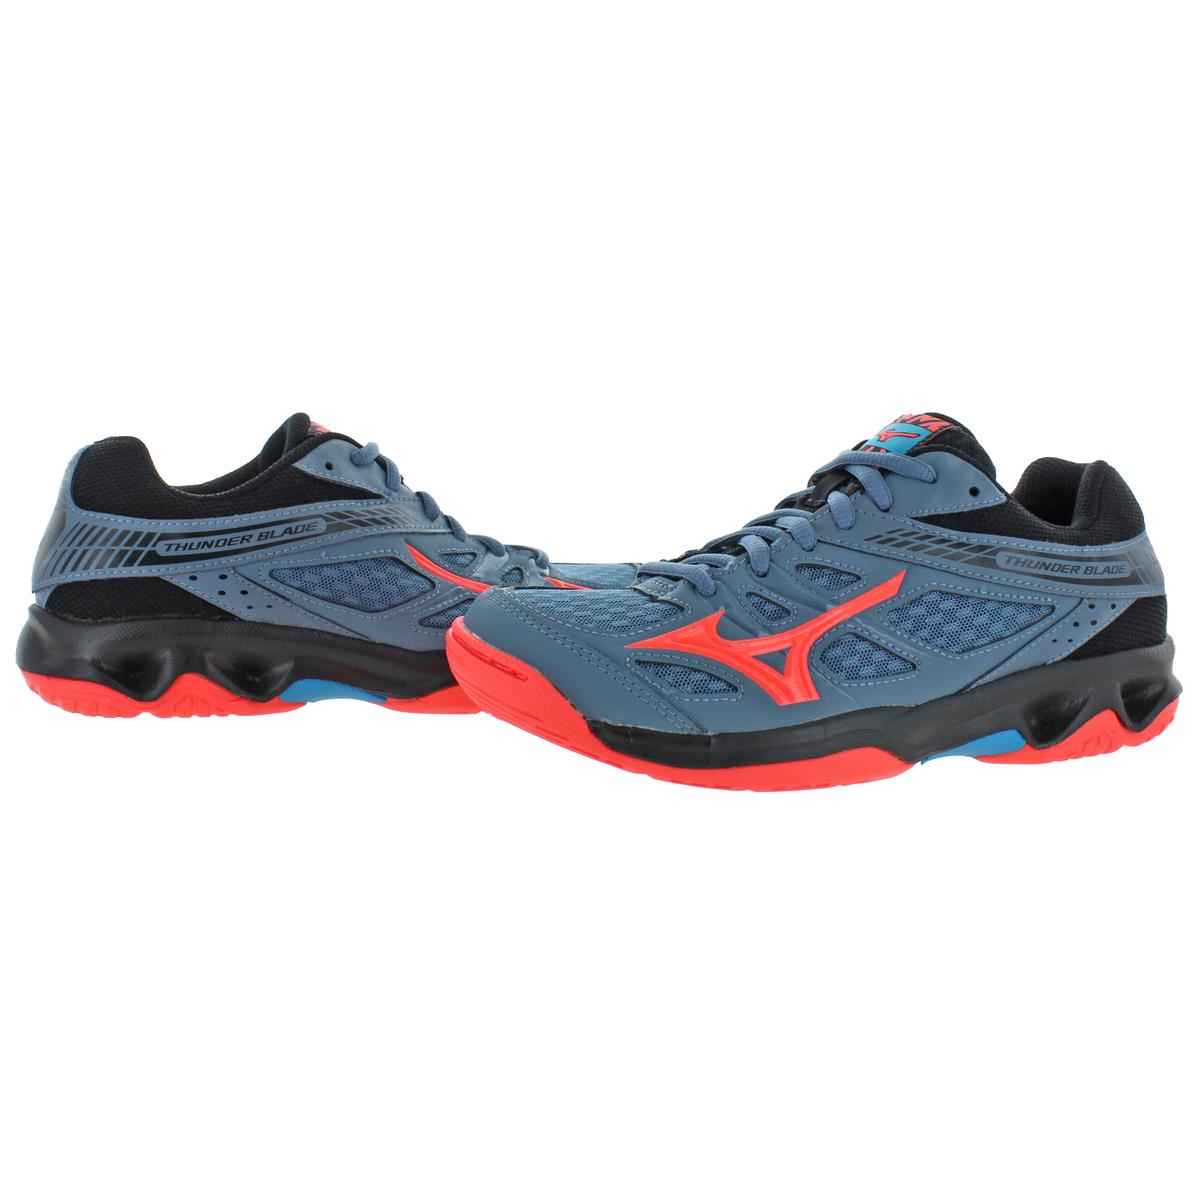 Mizuno-Womens-Thunder-Blade-Low-Top-Non-Marking-Sneakers-Shoes-BHFO-9051 thumbnail 6